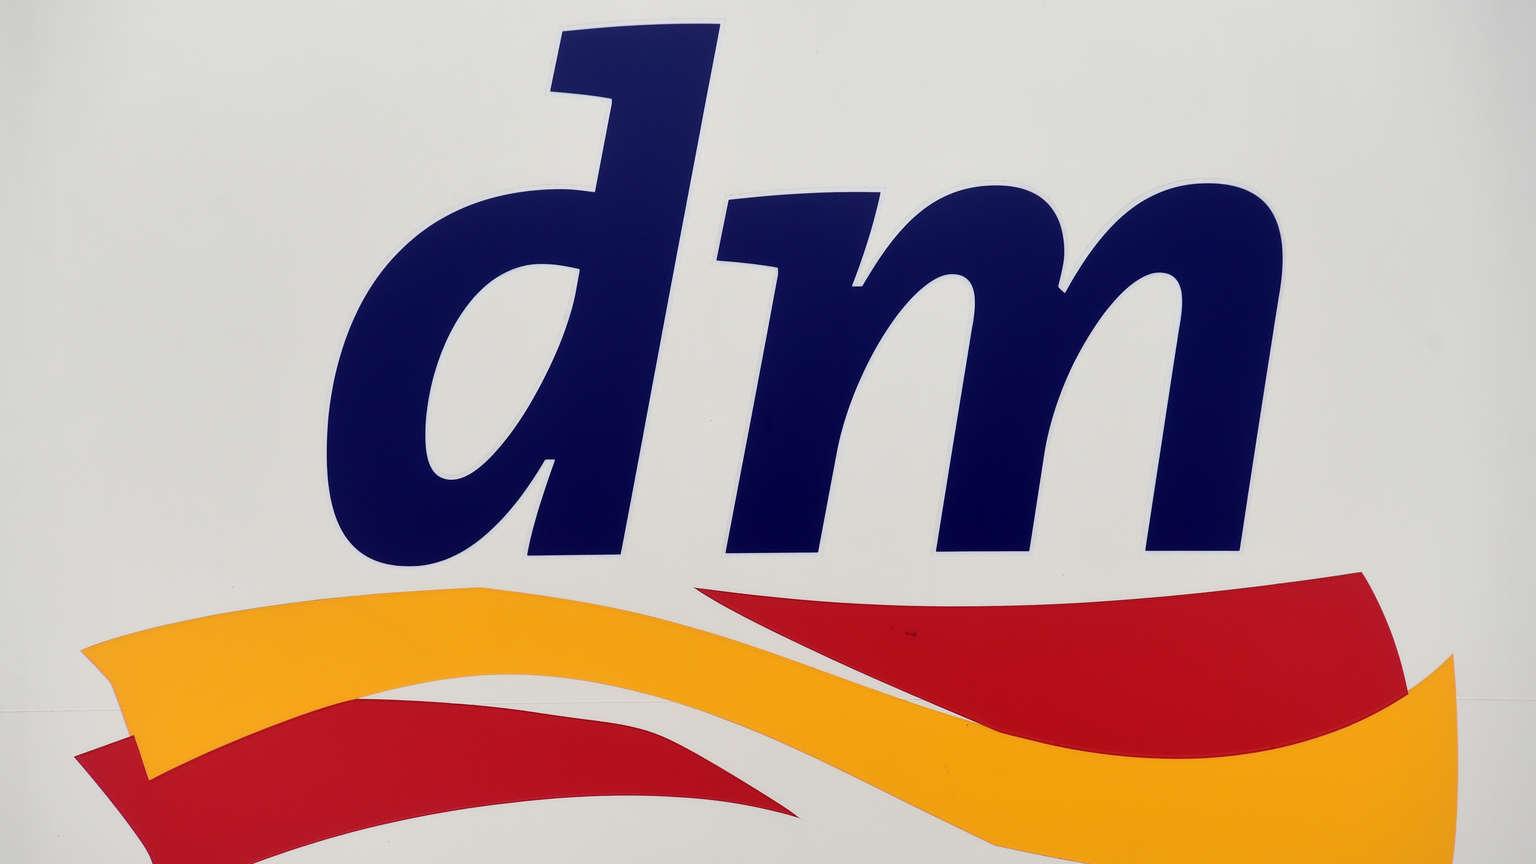 dm-drogerie eröffnet größten markt der geschichte - im 1